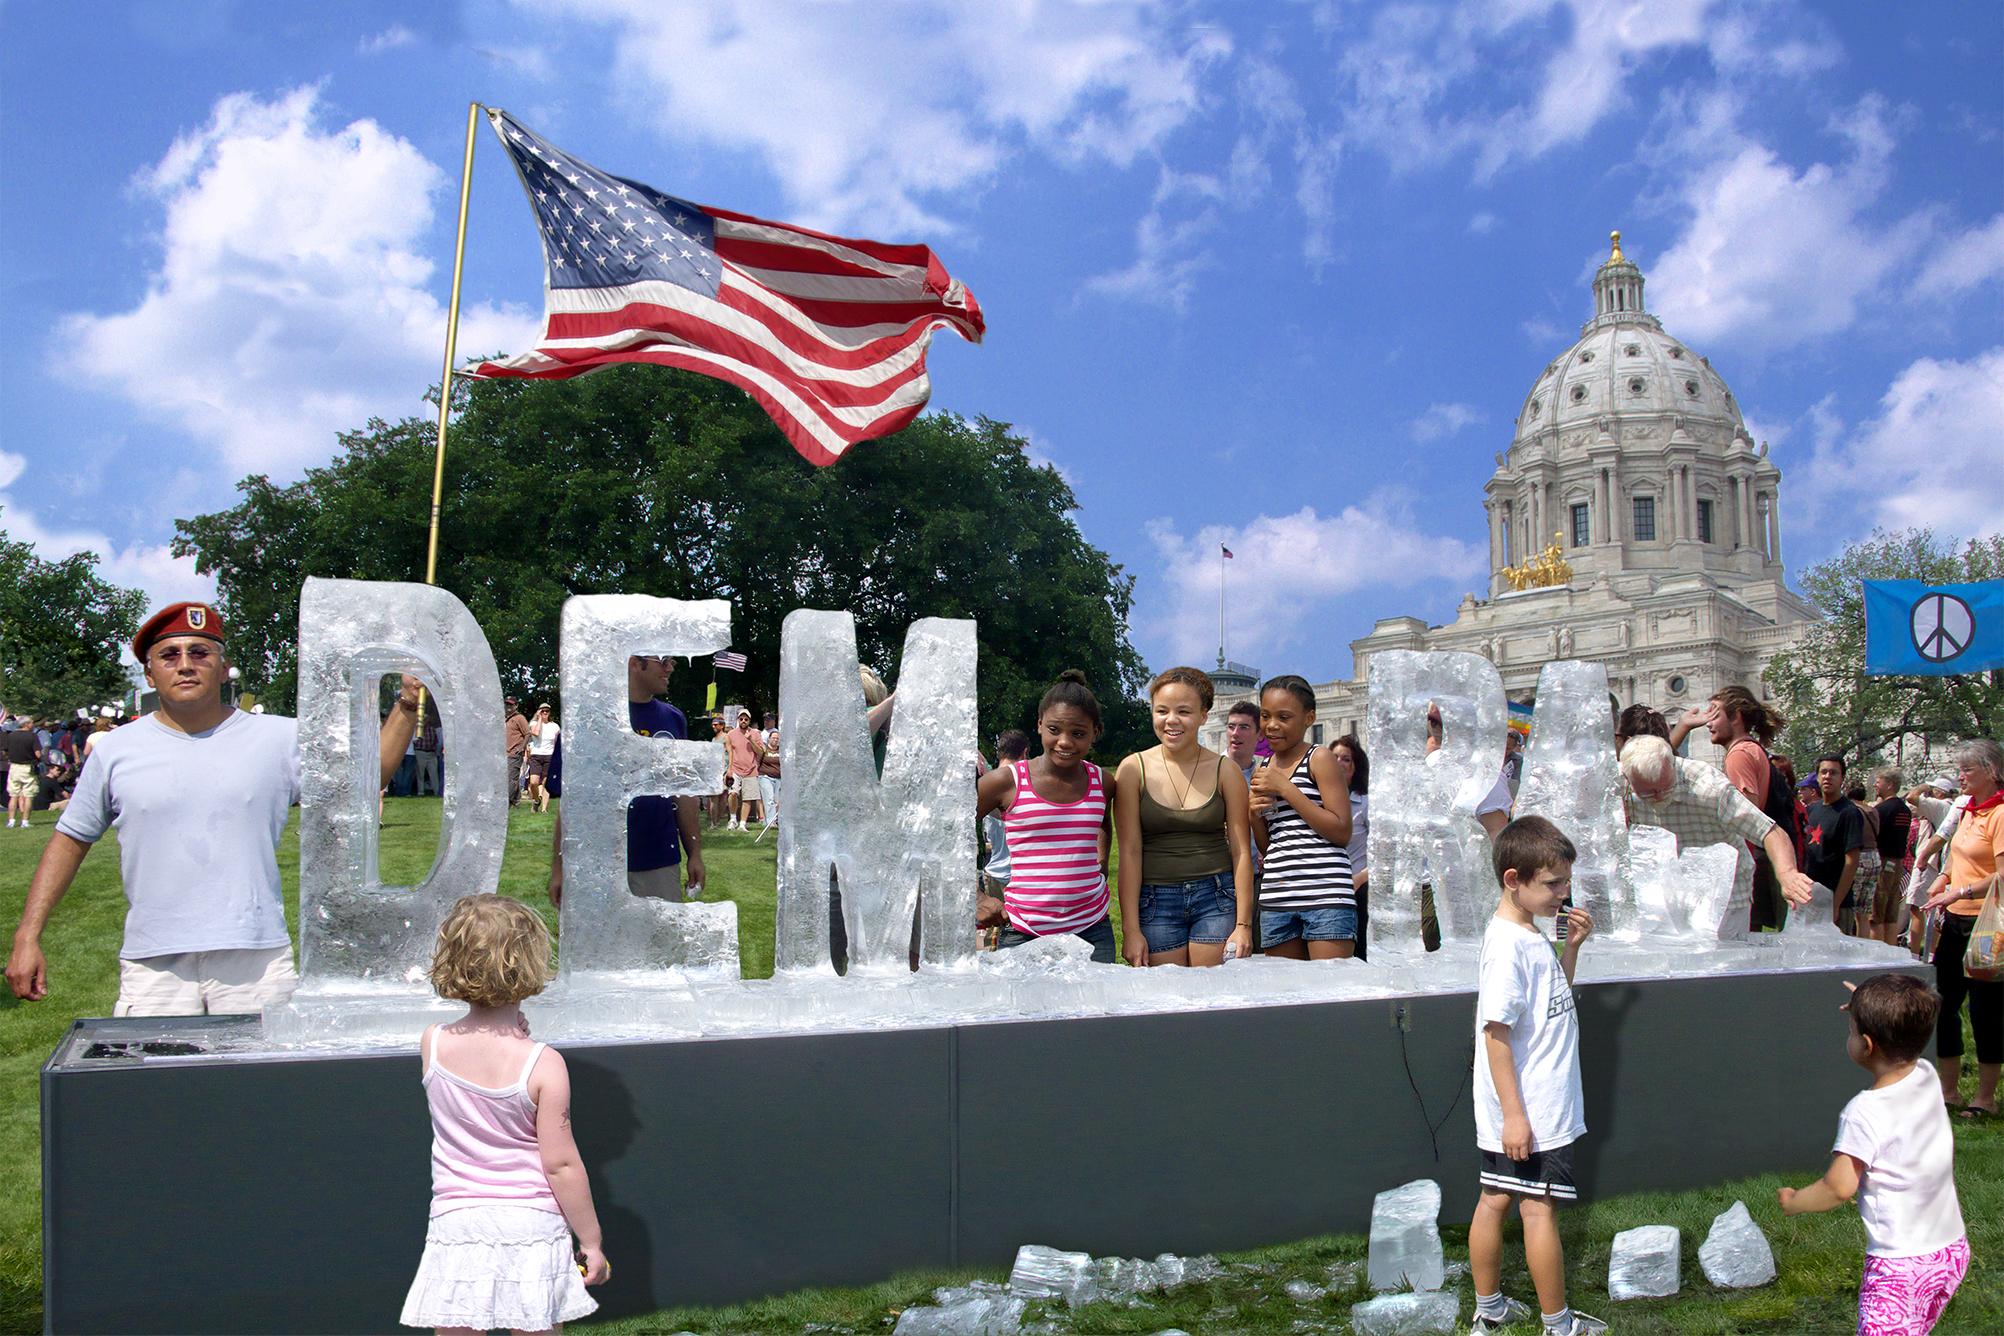 Democracy in St. Paul